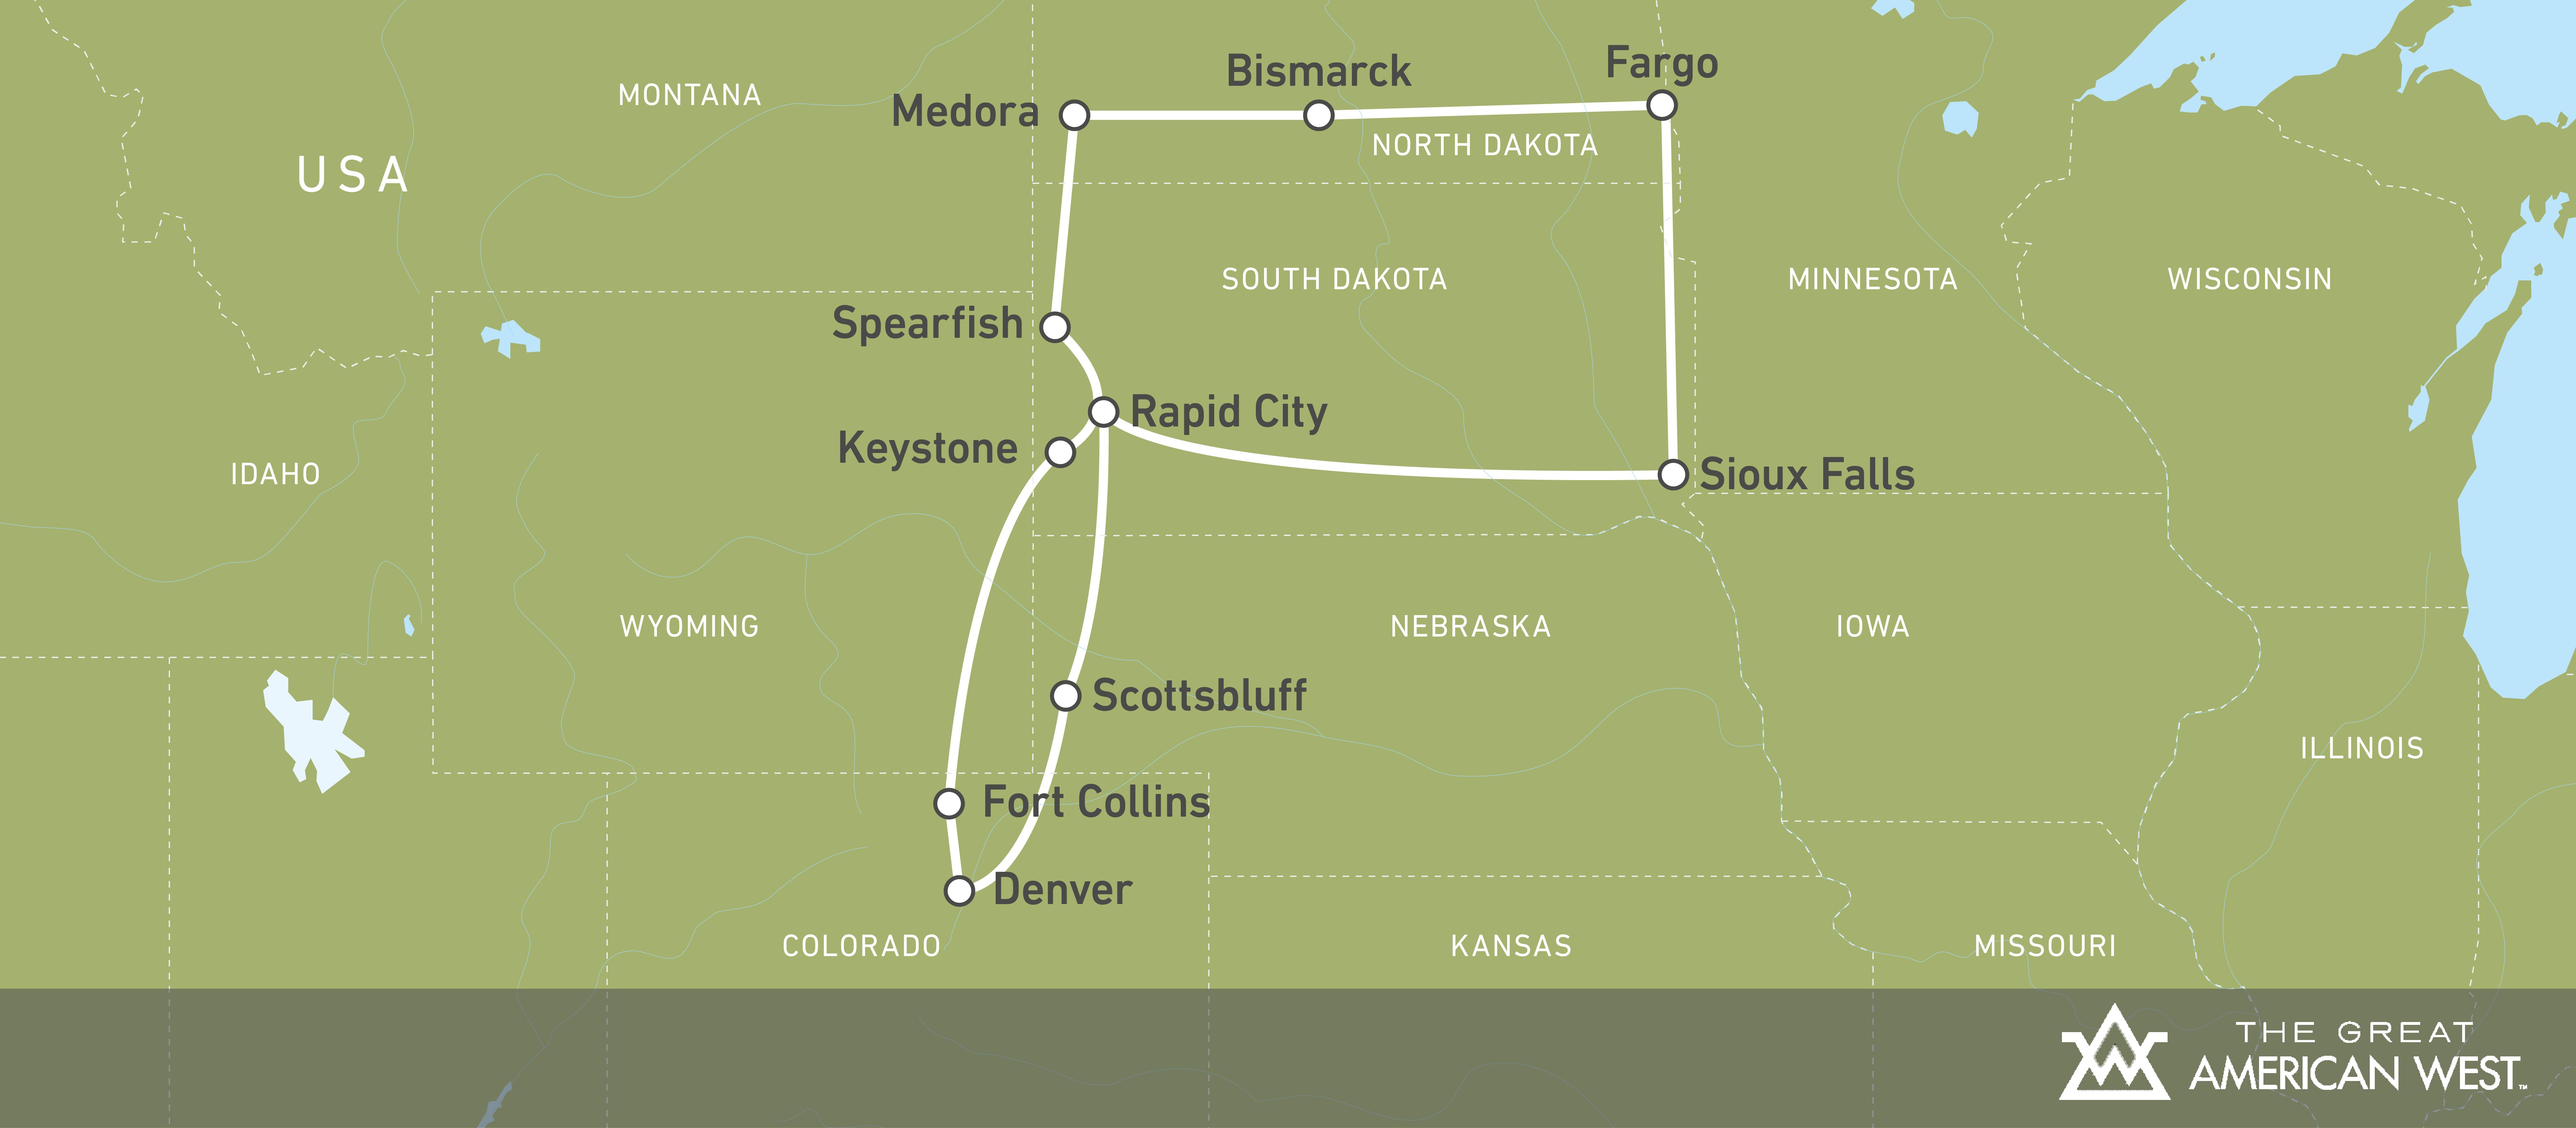 12-tägige Route durch North und South Dakota! | CANUSA